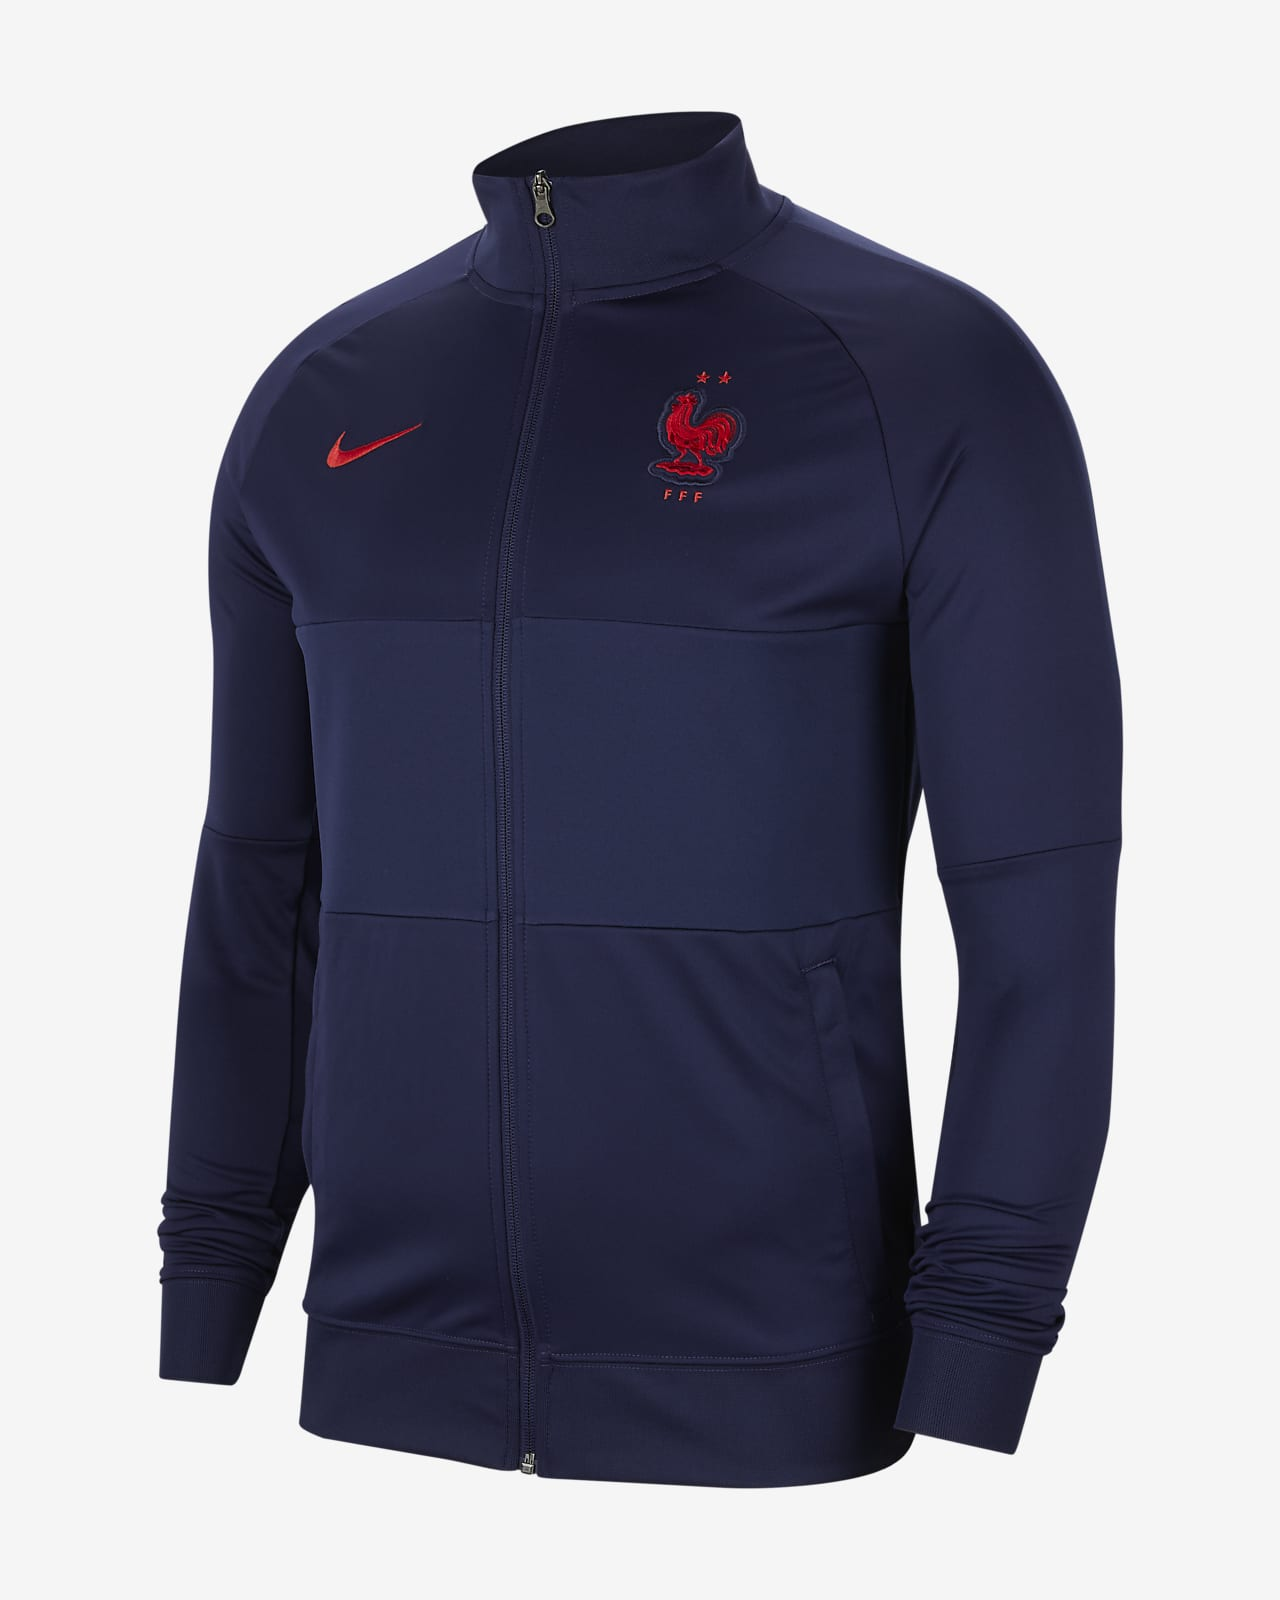 FFF Men's Football Track Jacket